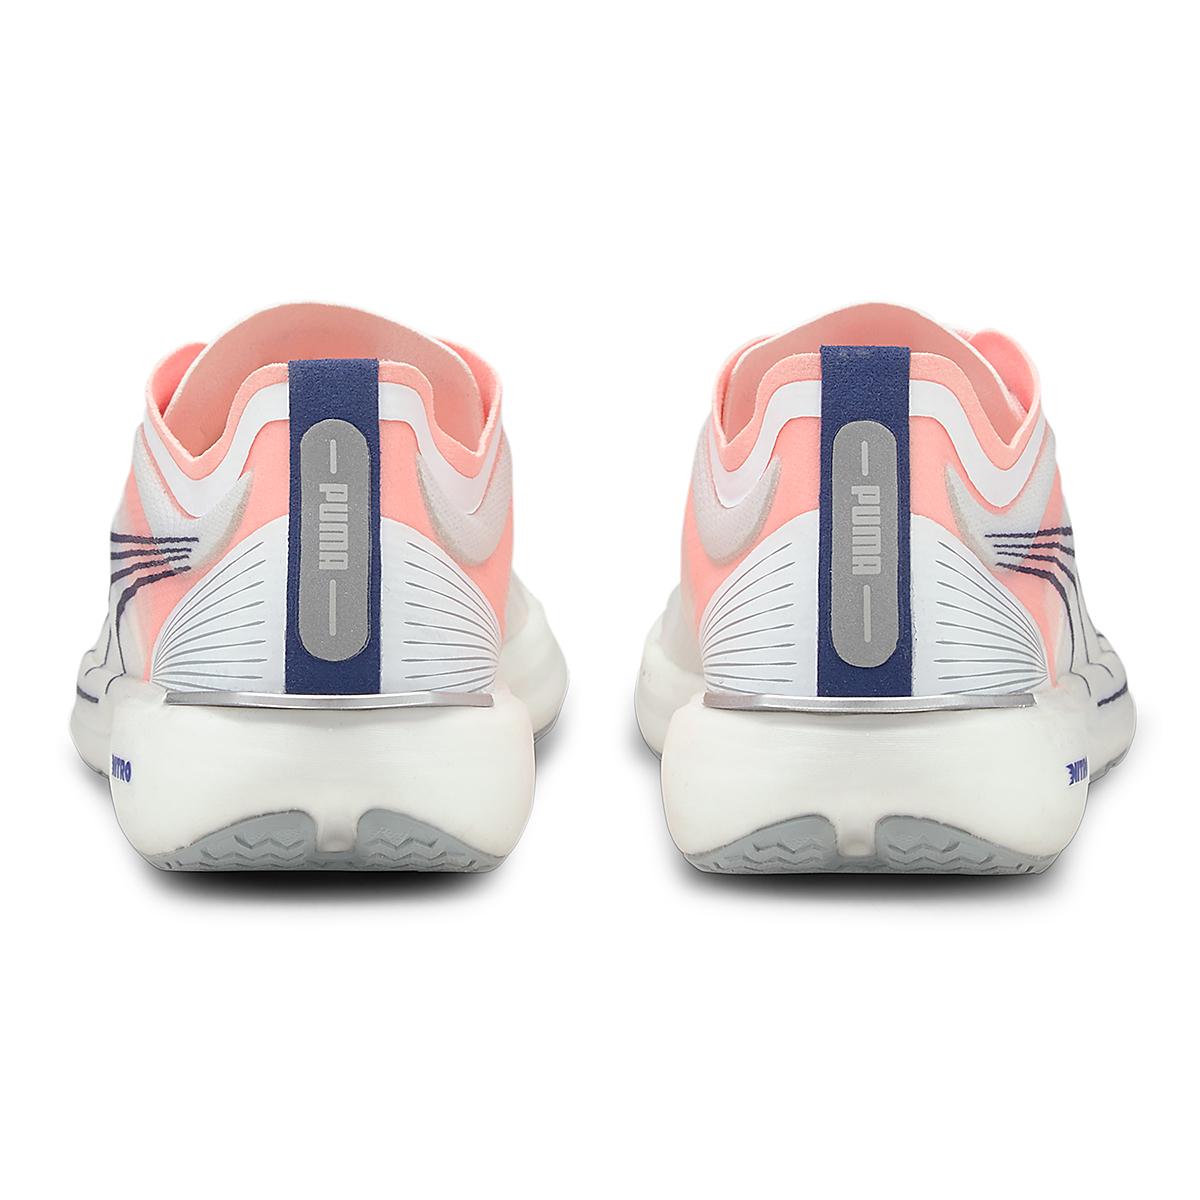 Women's Puma Liberate Nitro Running Shoe - Color: Puma White-Elektro Peach - Size: 6.5 - Width: Regular, Puma White-Elektro Peach, large, image 3